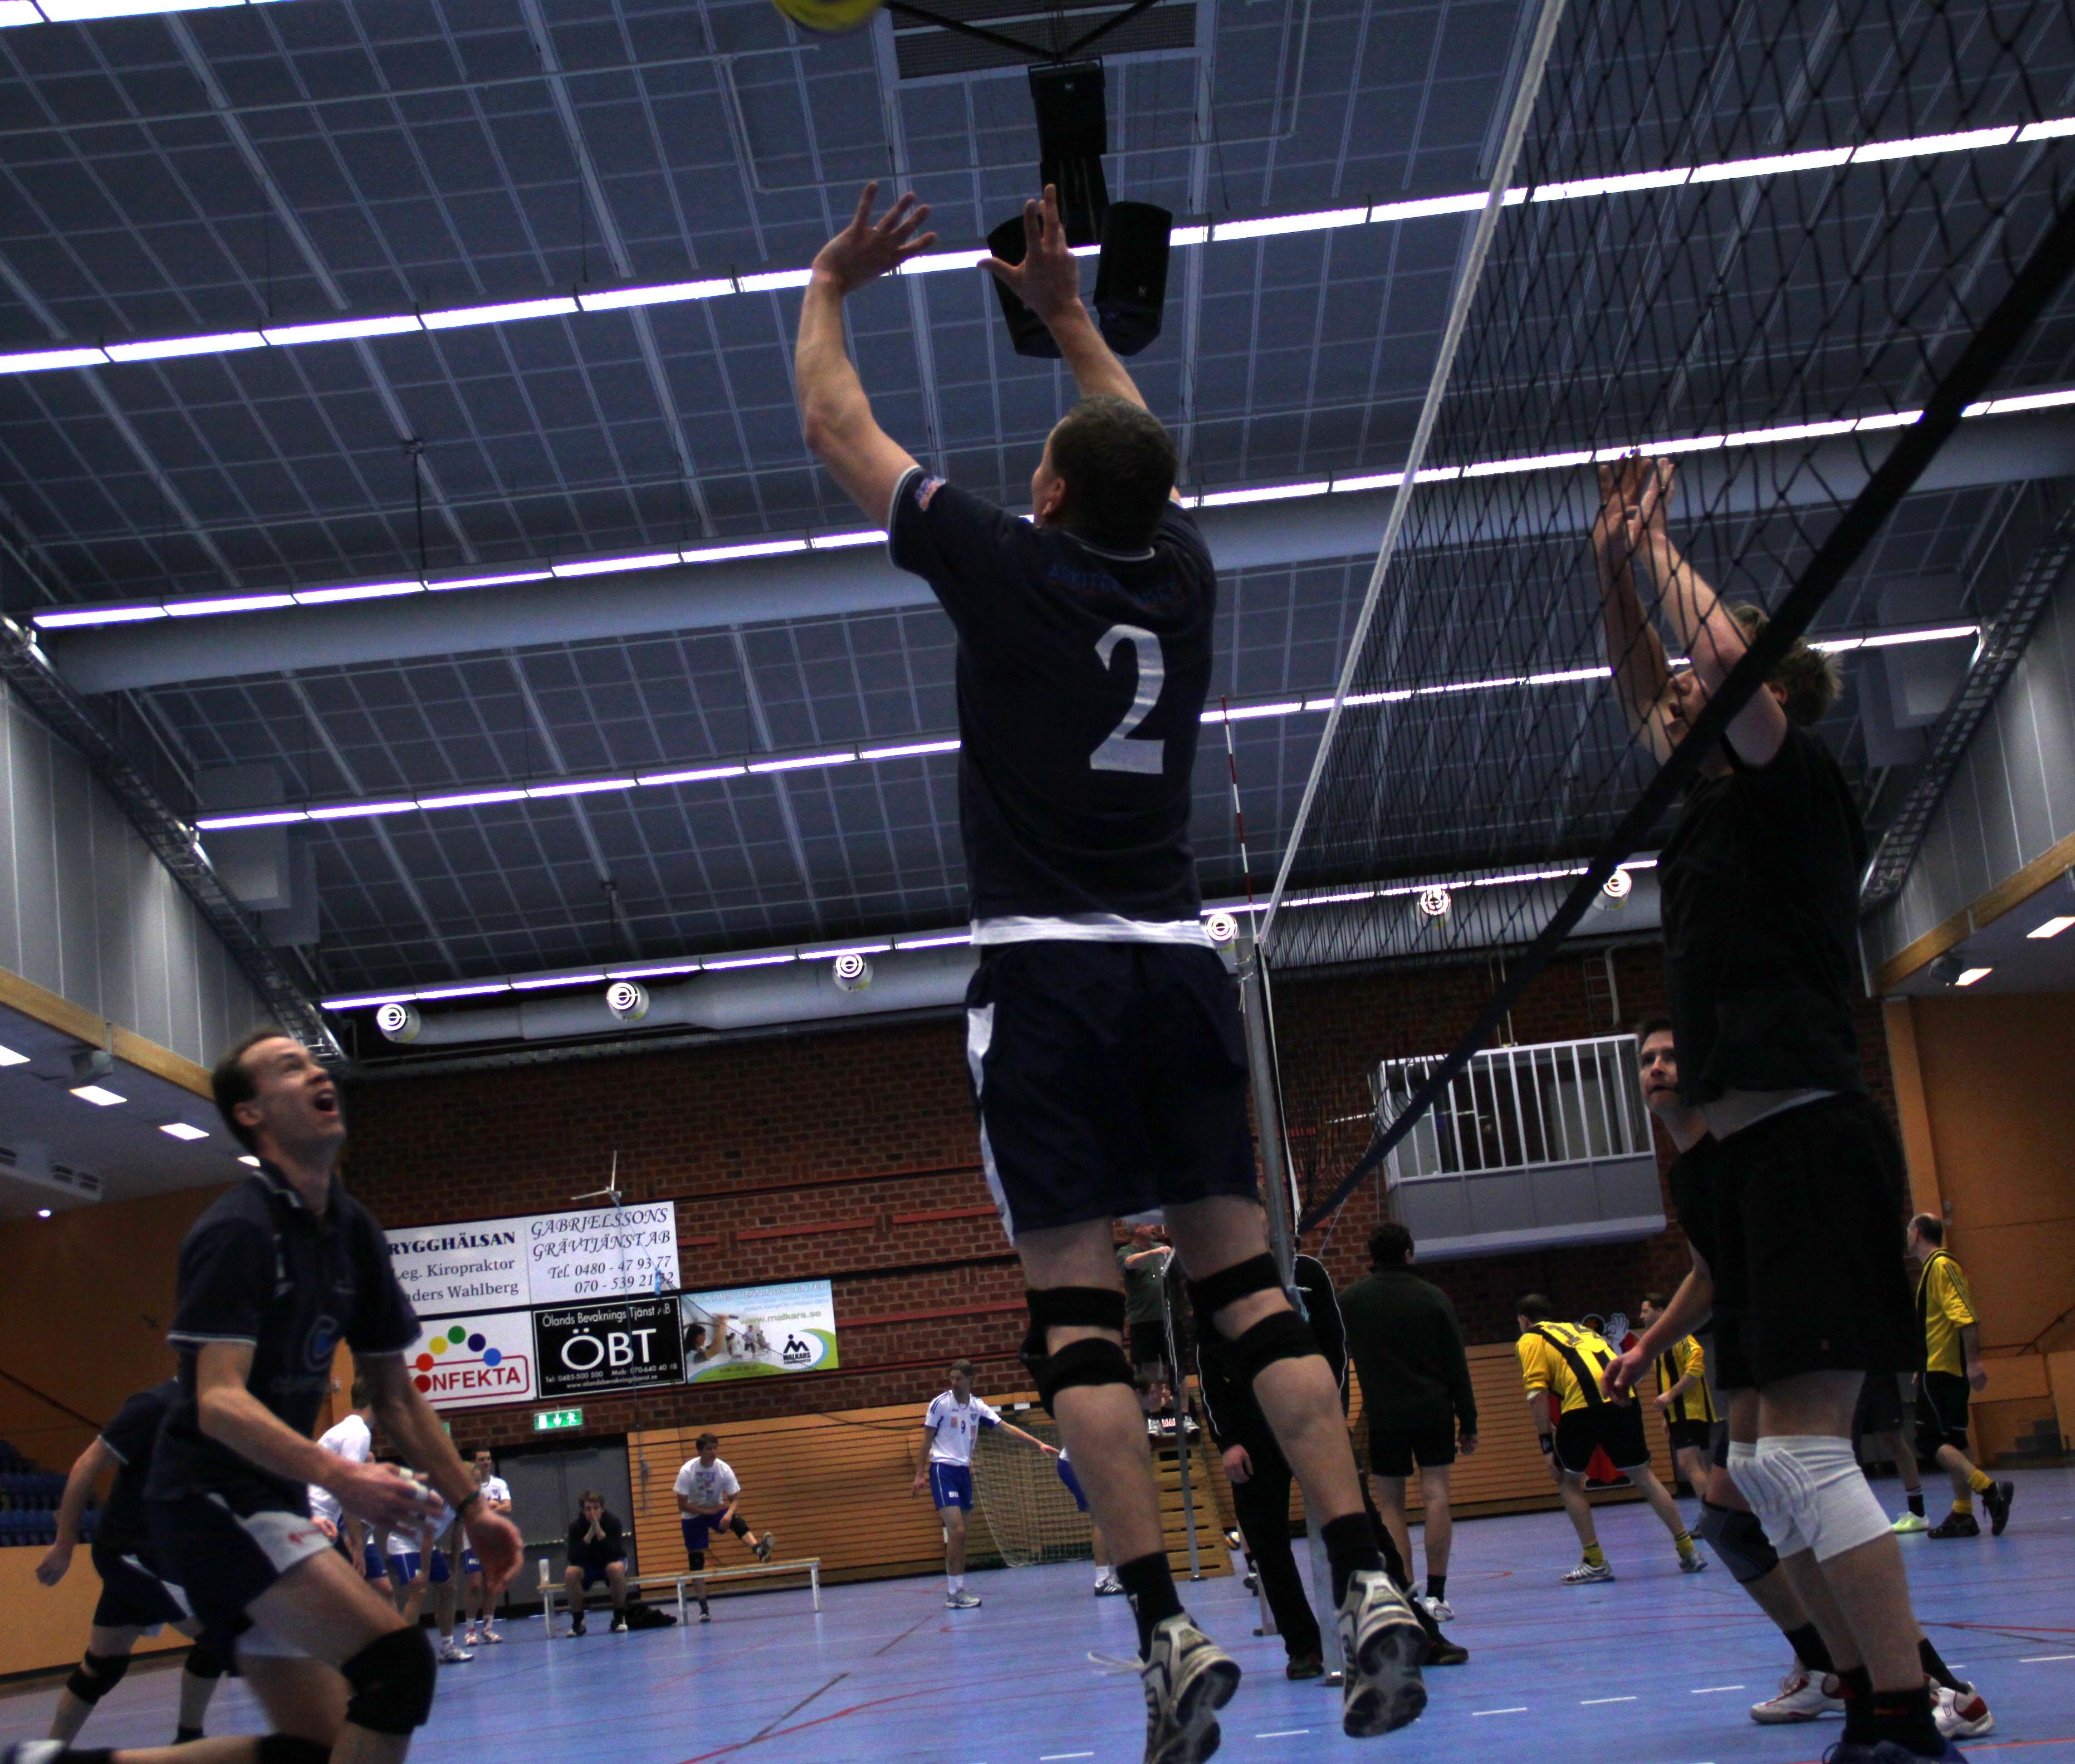 Volleyboll 053 Kopiera 1 Kalmar Volleybollklubb